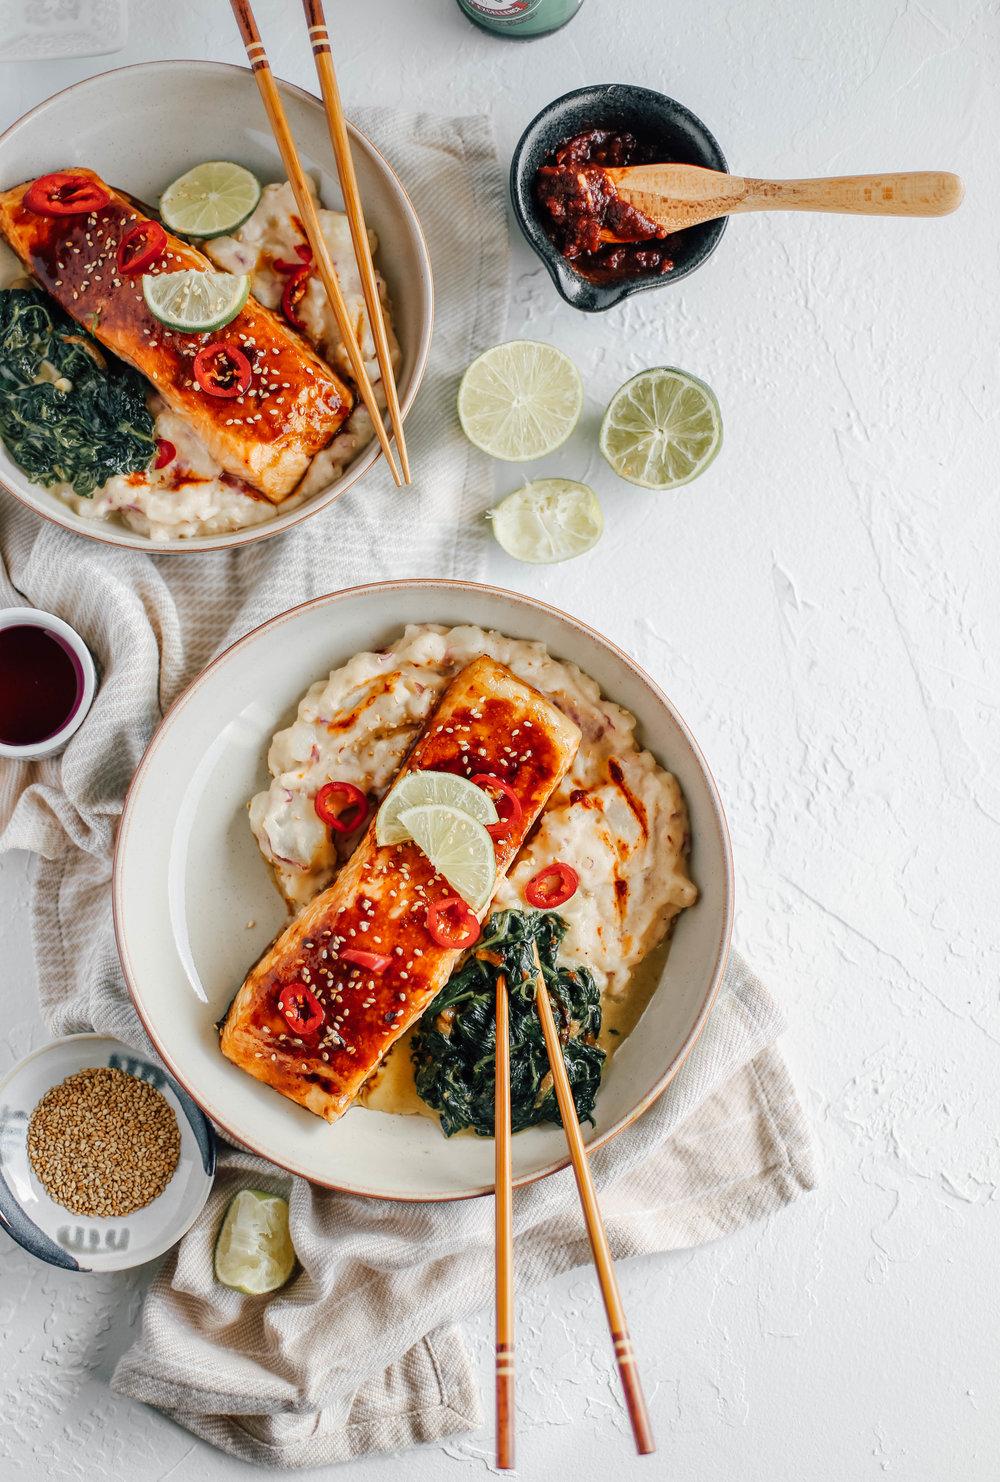 Teriyaki Salmon and Chipotle Goat Cheese-8.jpg